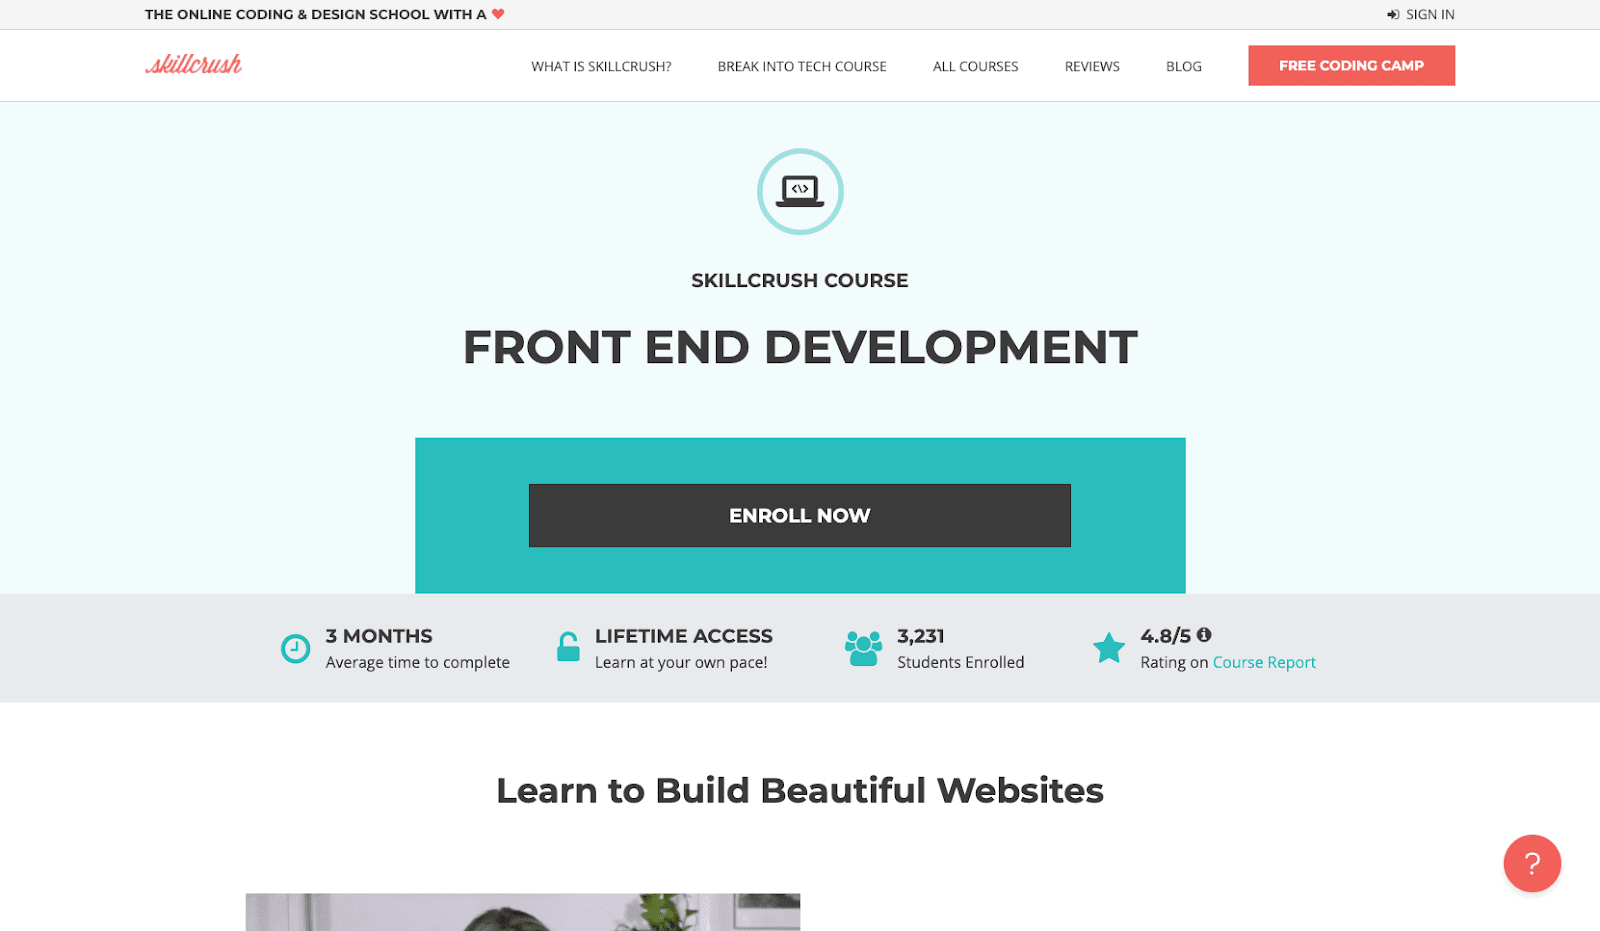 A screenshot of Skillcrush's website